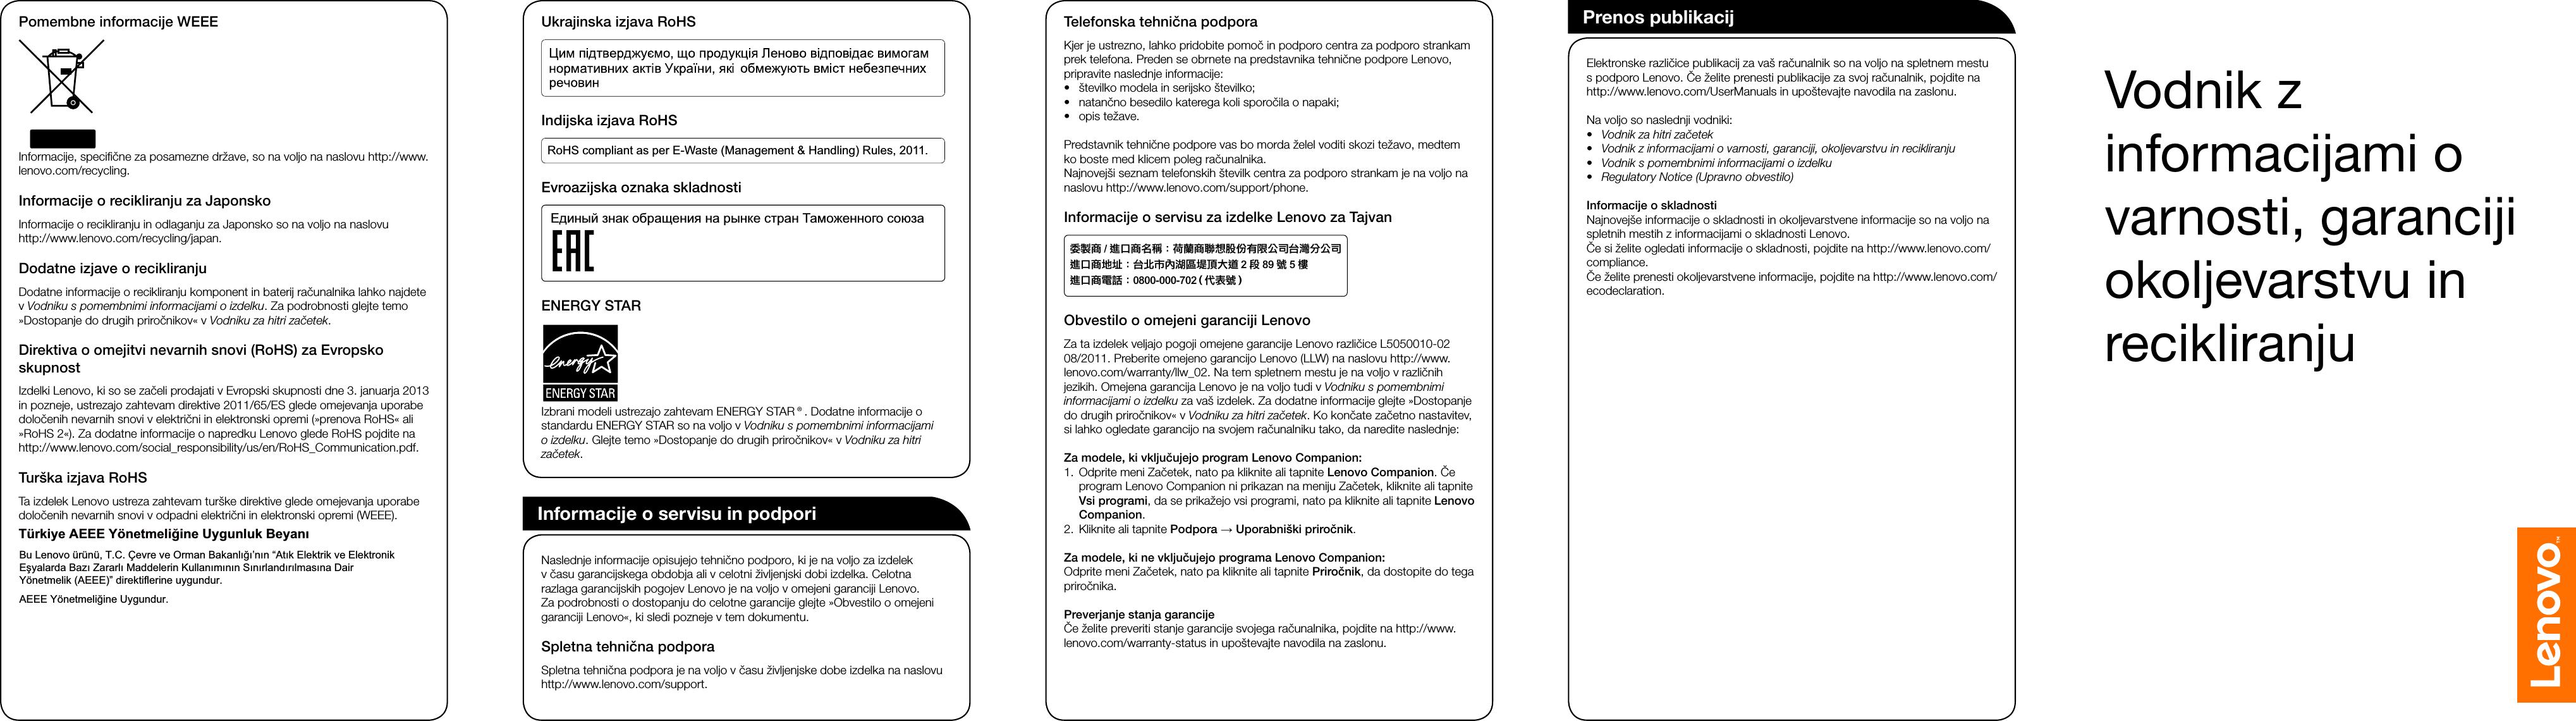 Lenovo Ic Swrg V1 0 3 N Win10 Sl Online 20160509 User Manual